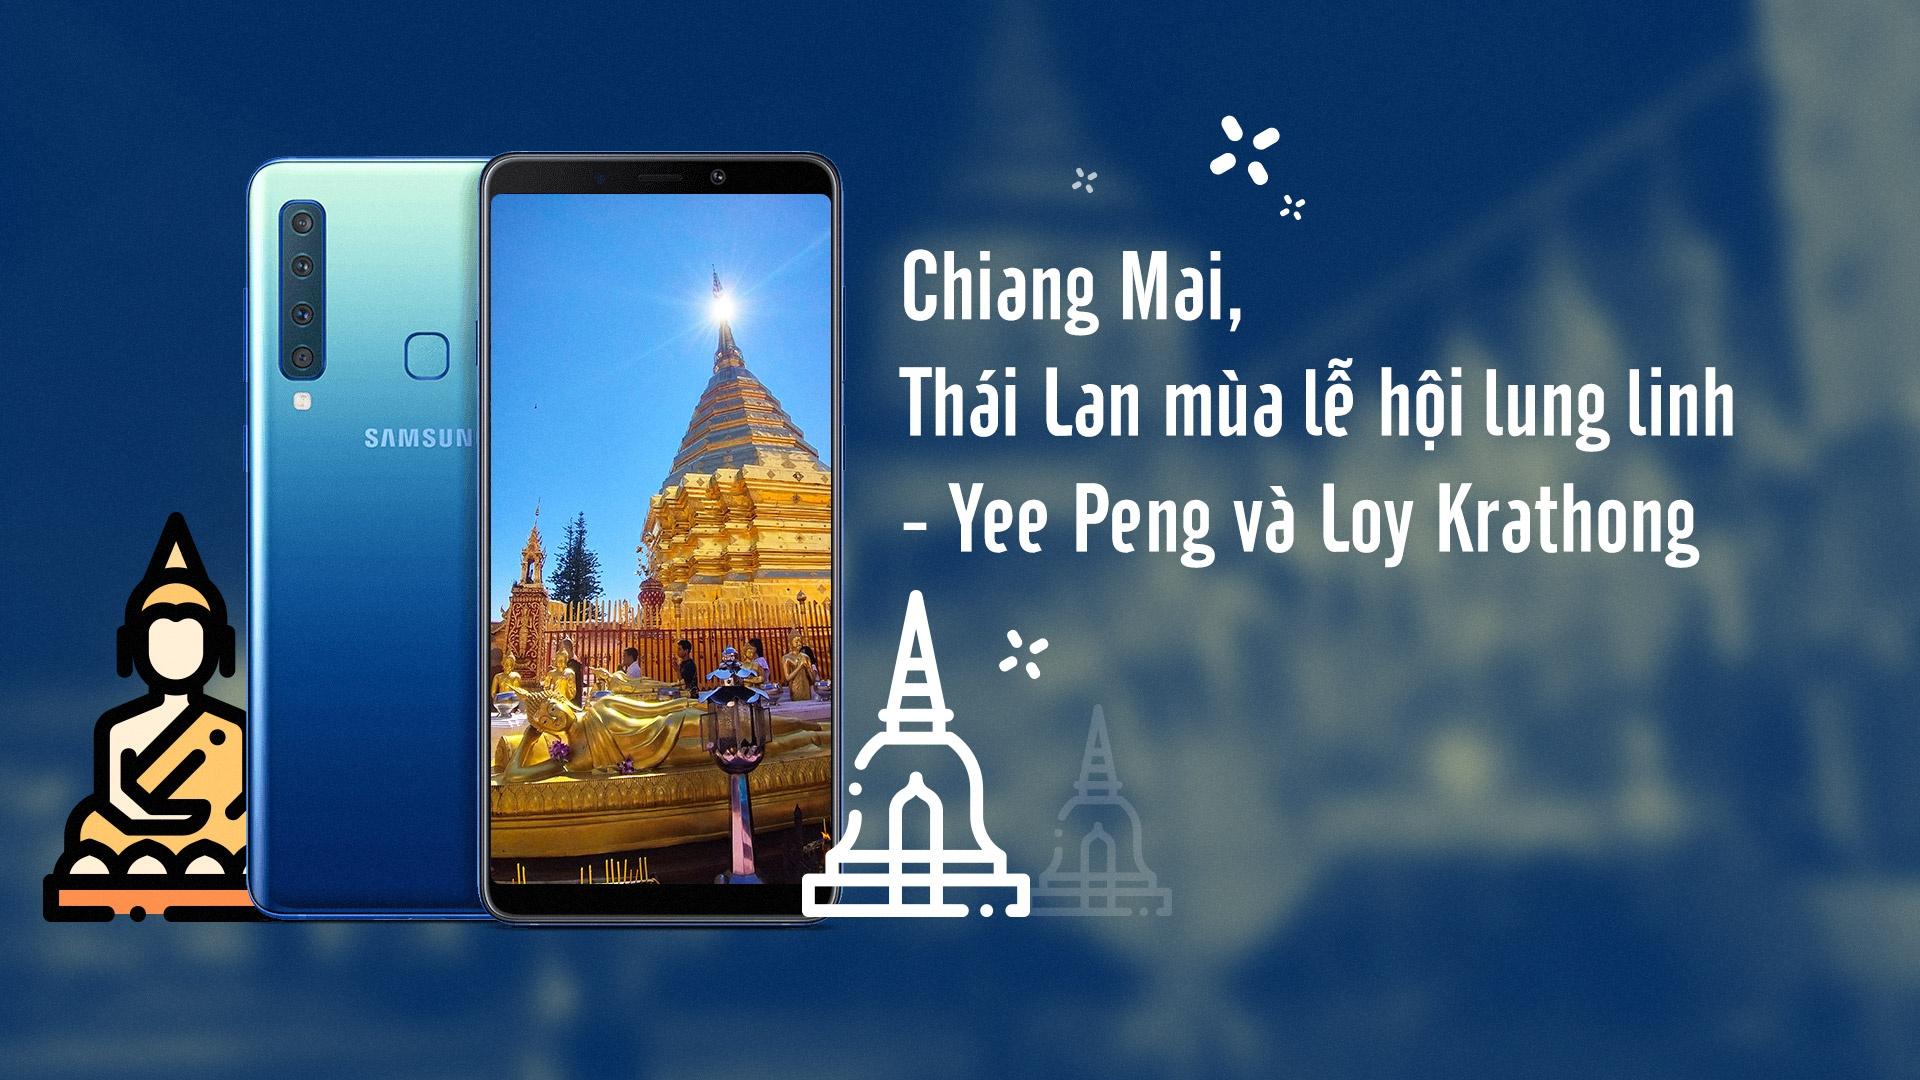 Chiang Mai, Thai Lan mua le hoi lung linh - Yee Peng va Loy Krathong hinh anh 1